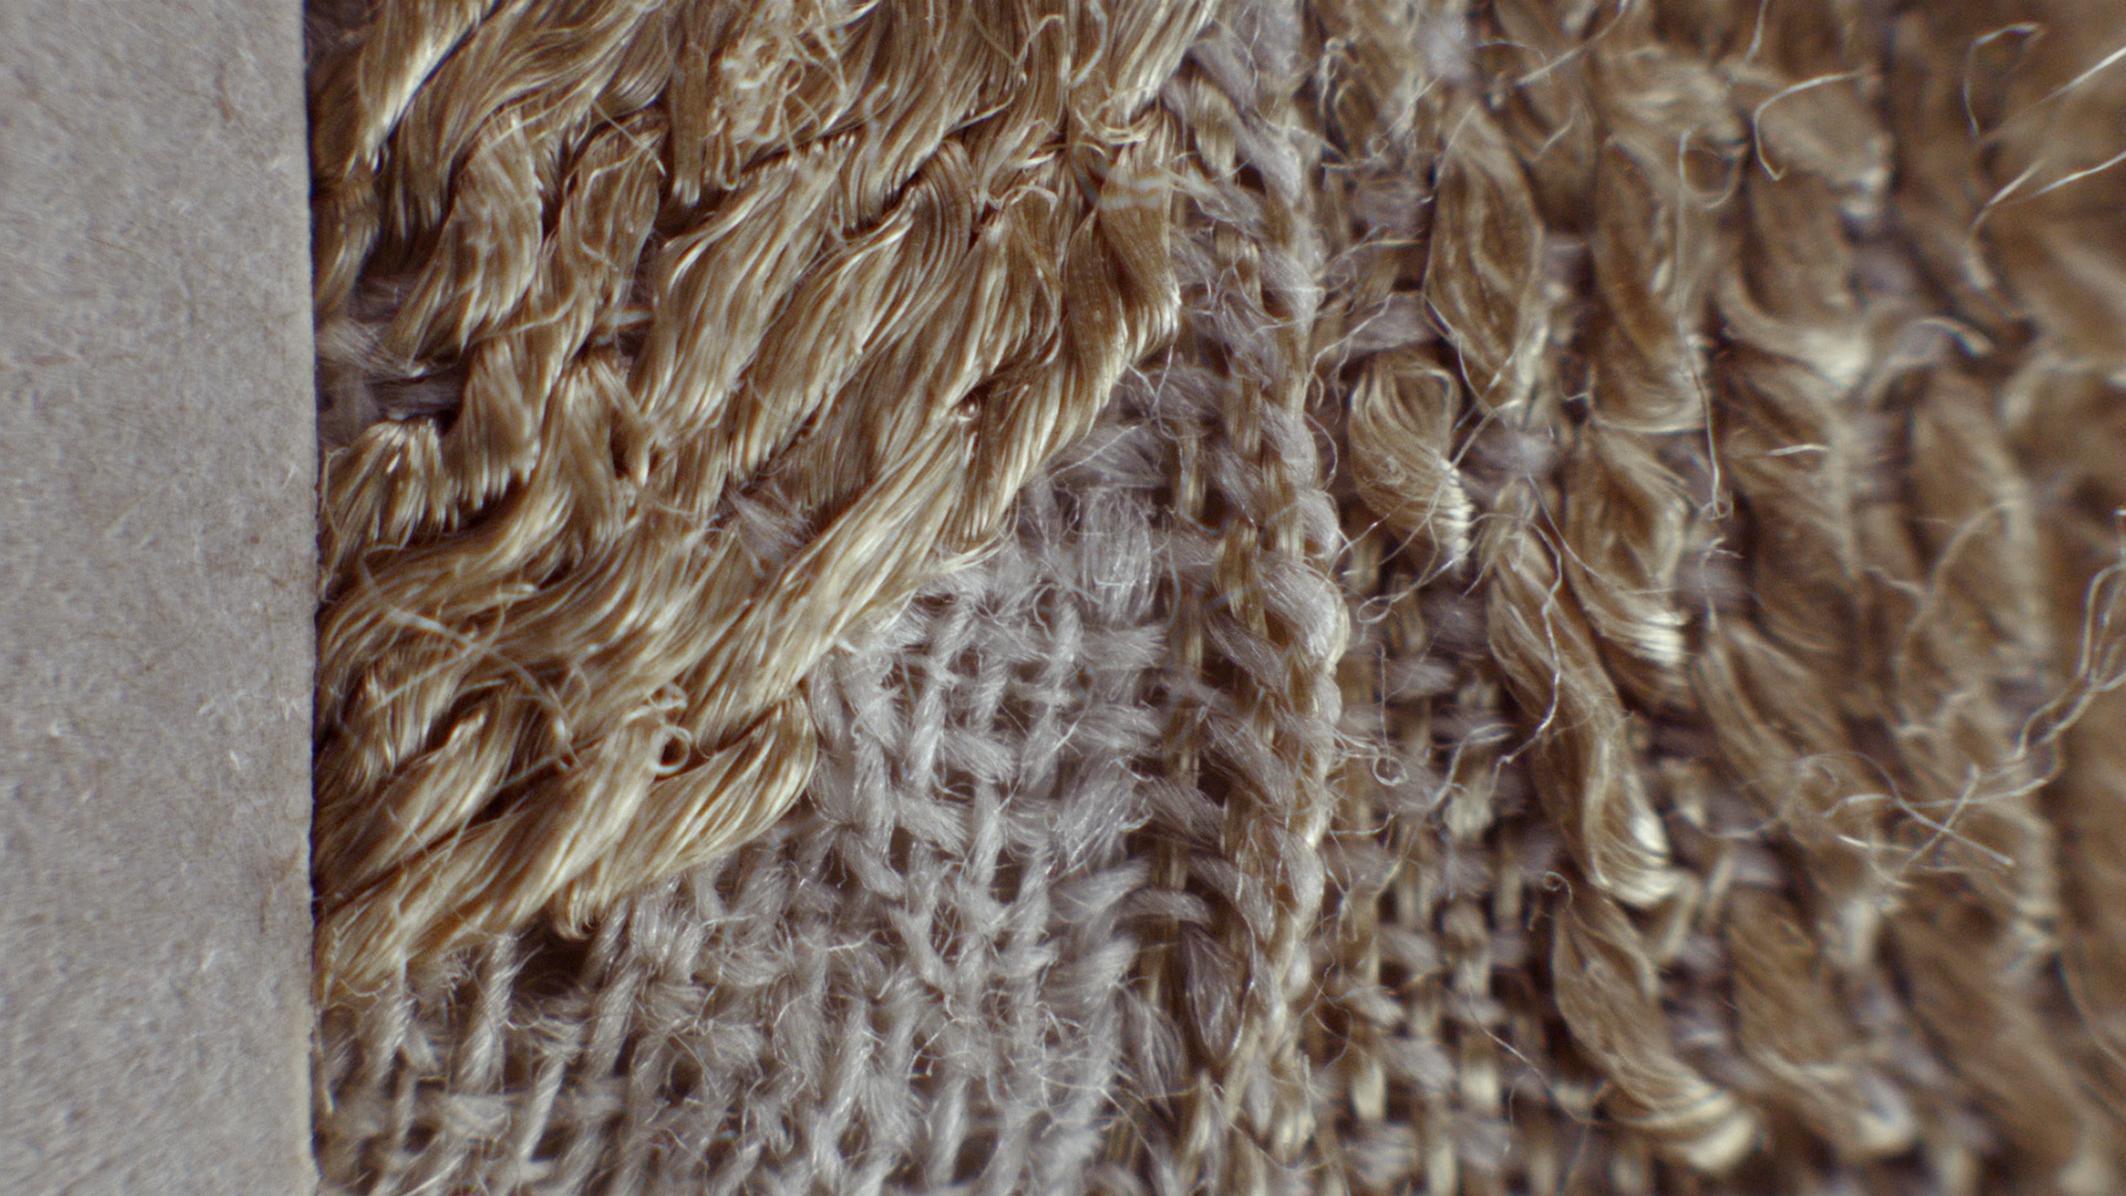 closeup of weaving pattern